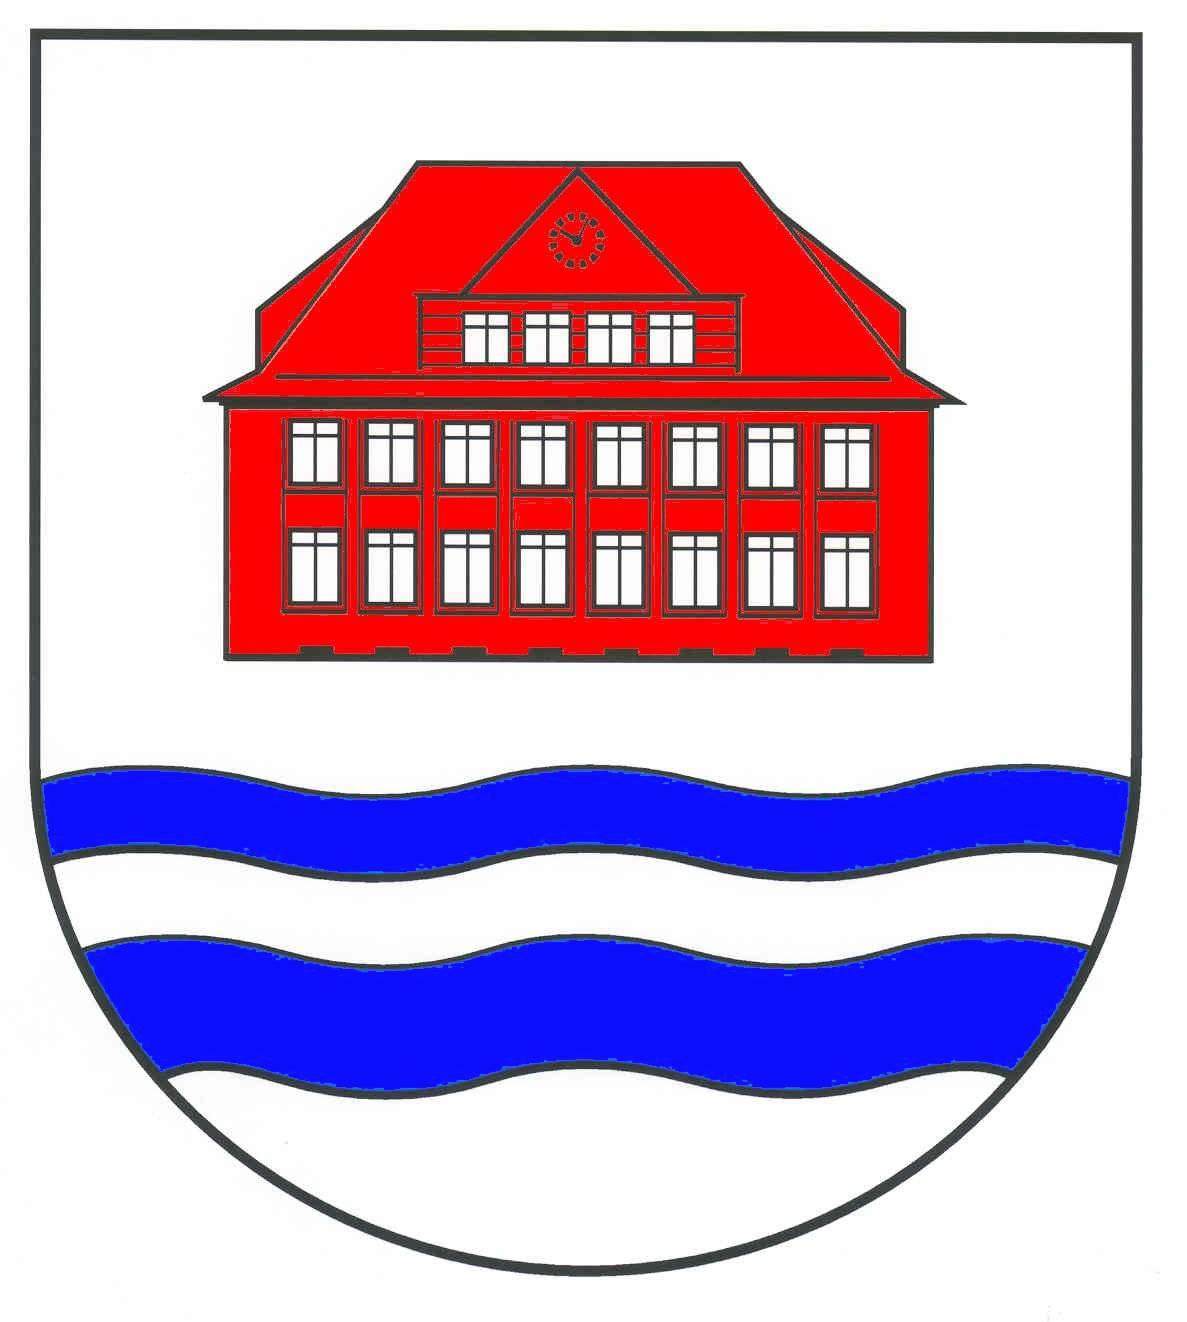 Wappen GemeindeBorstel-Hohenraden, Kreis Pinneberg